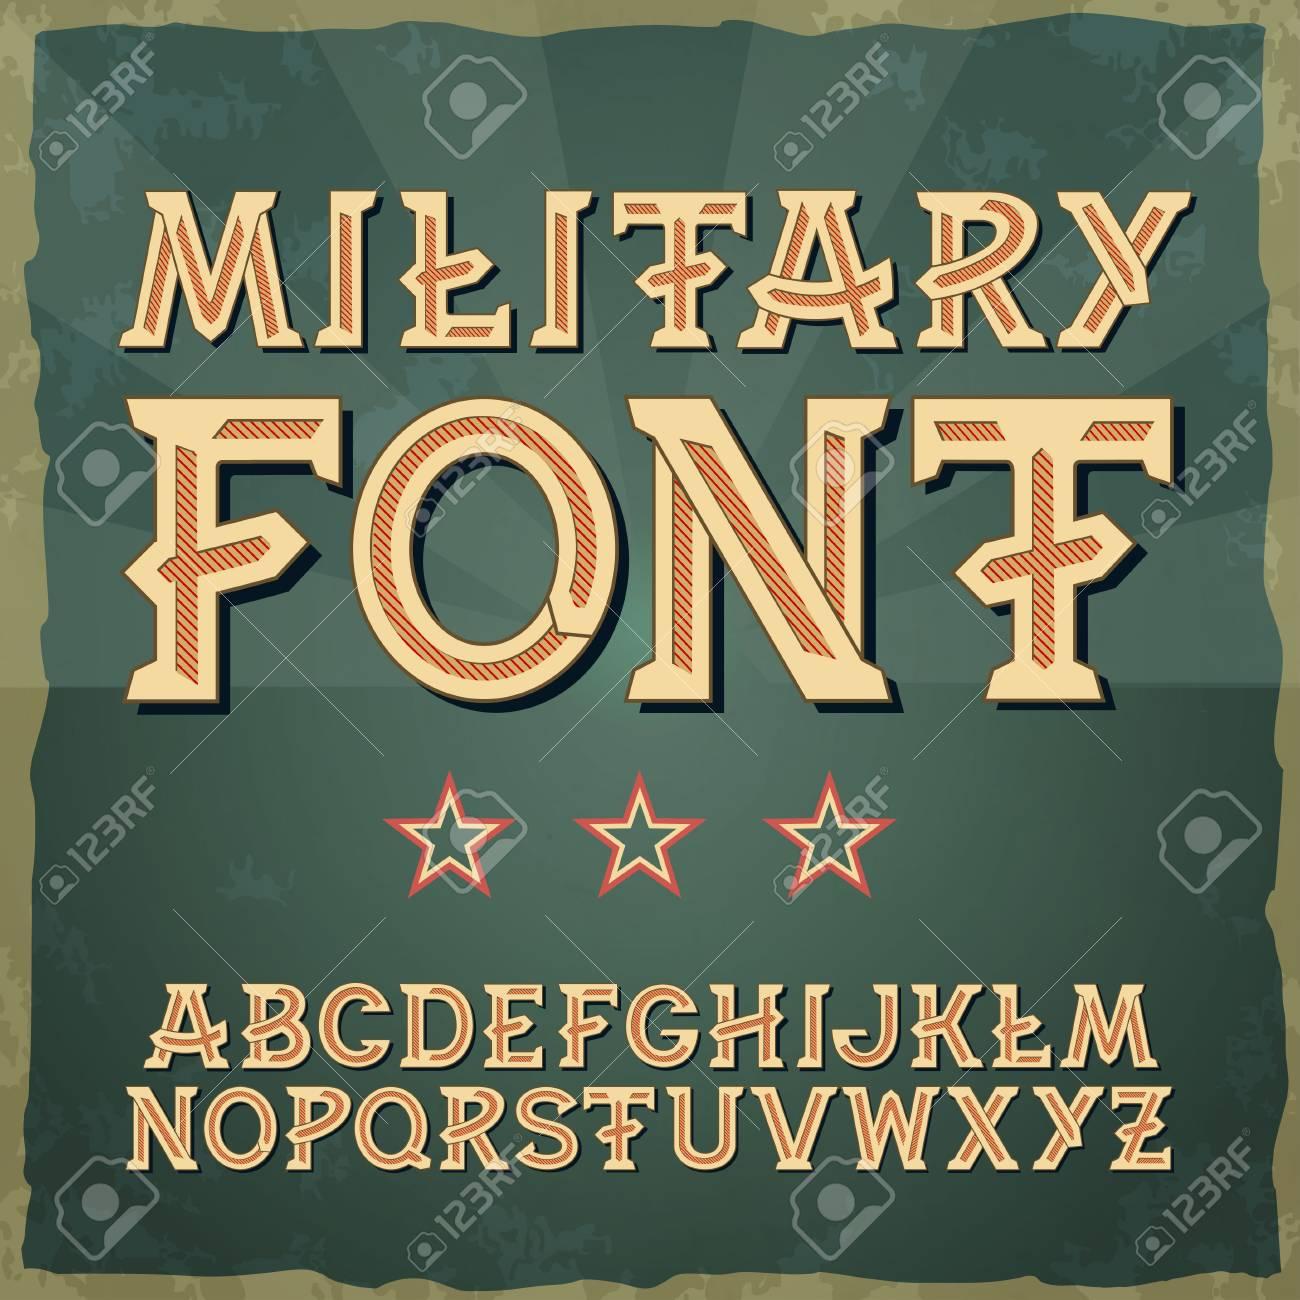 Retro type font vintage typography vintage alphabet vector font for labels titles